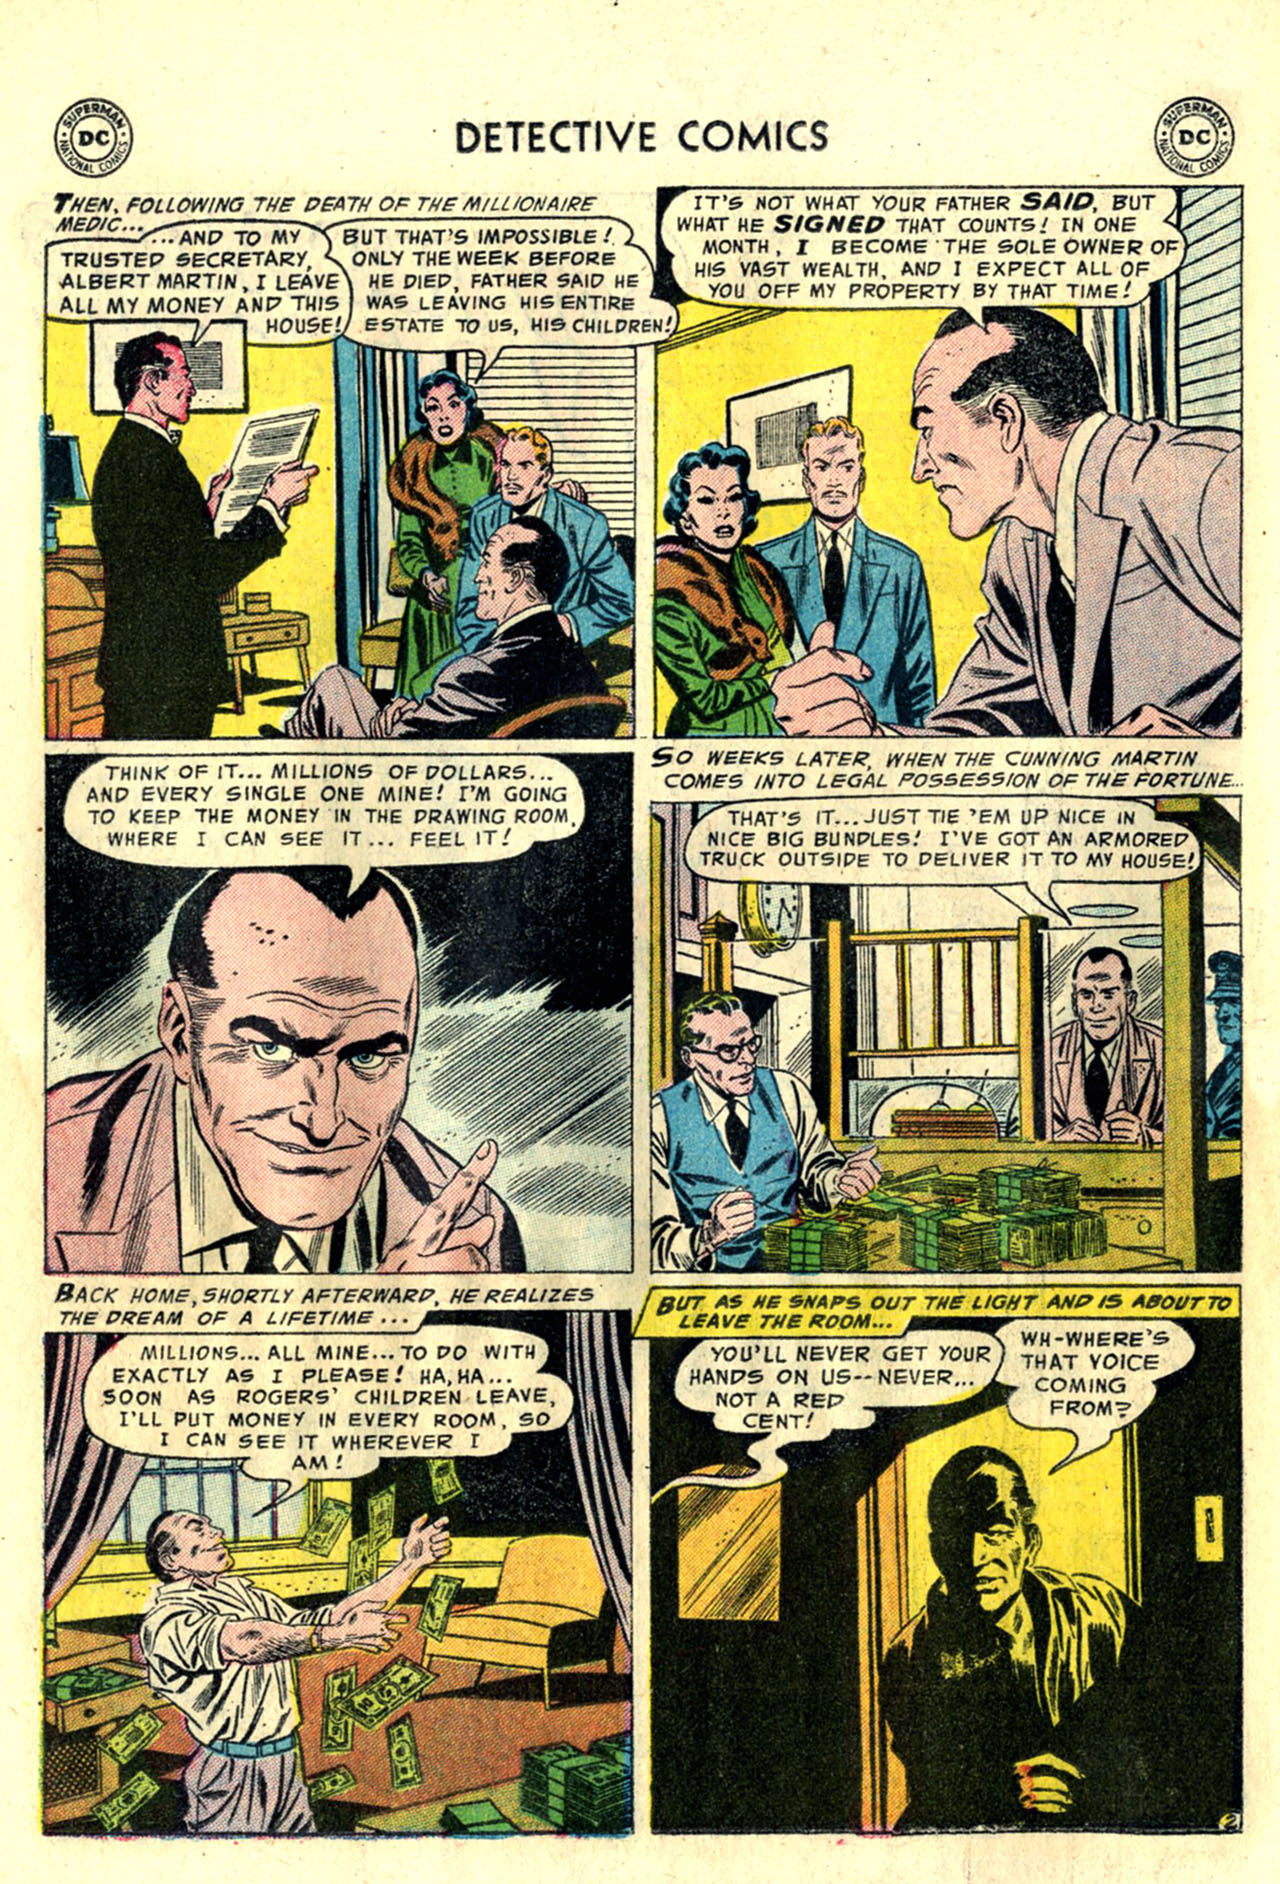 Detective Comics (1937) 225 Page 17